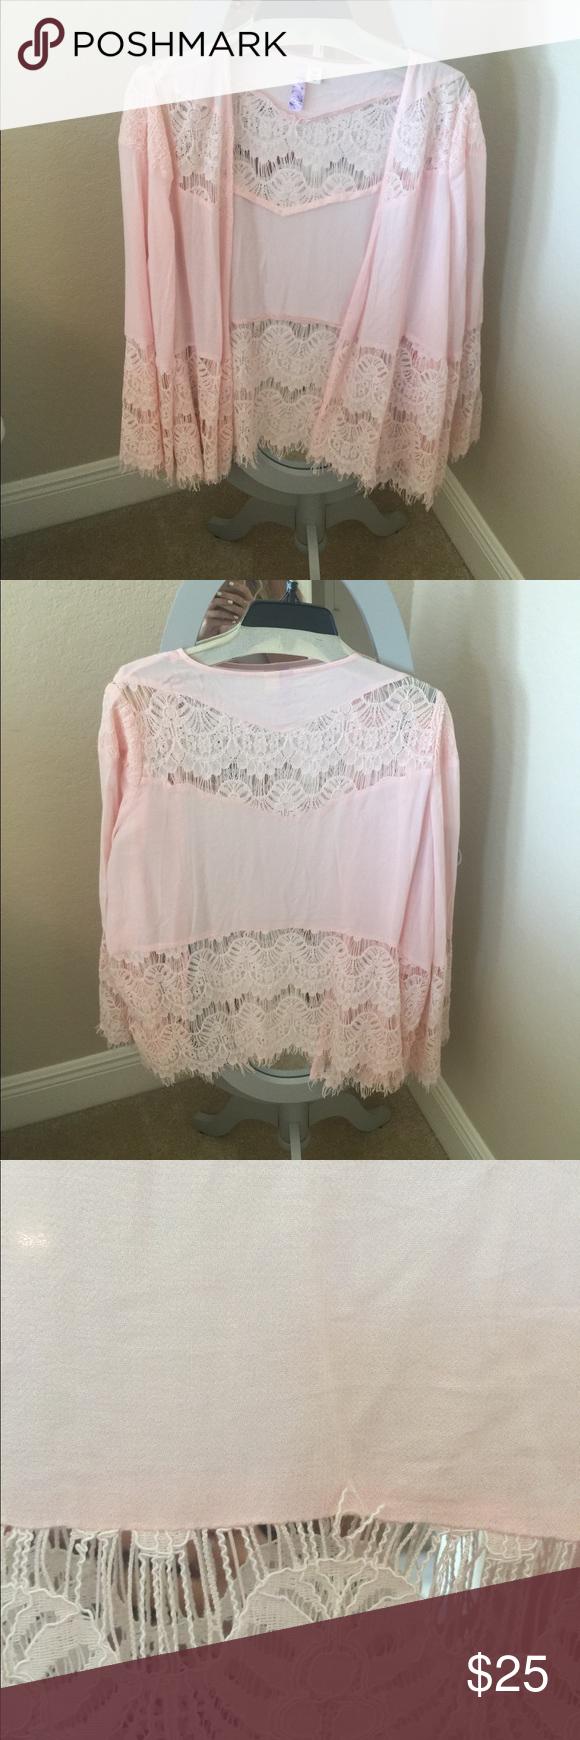 Light pink lace kimono